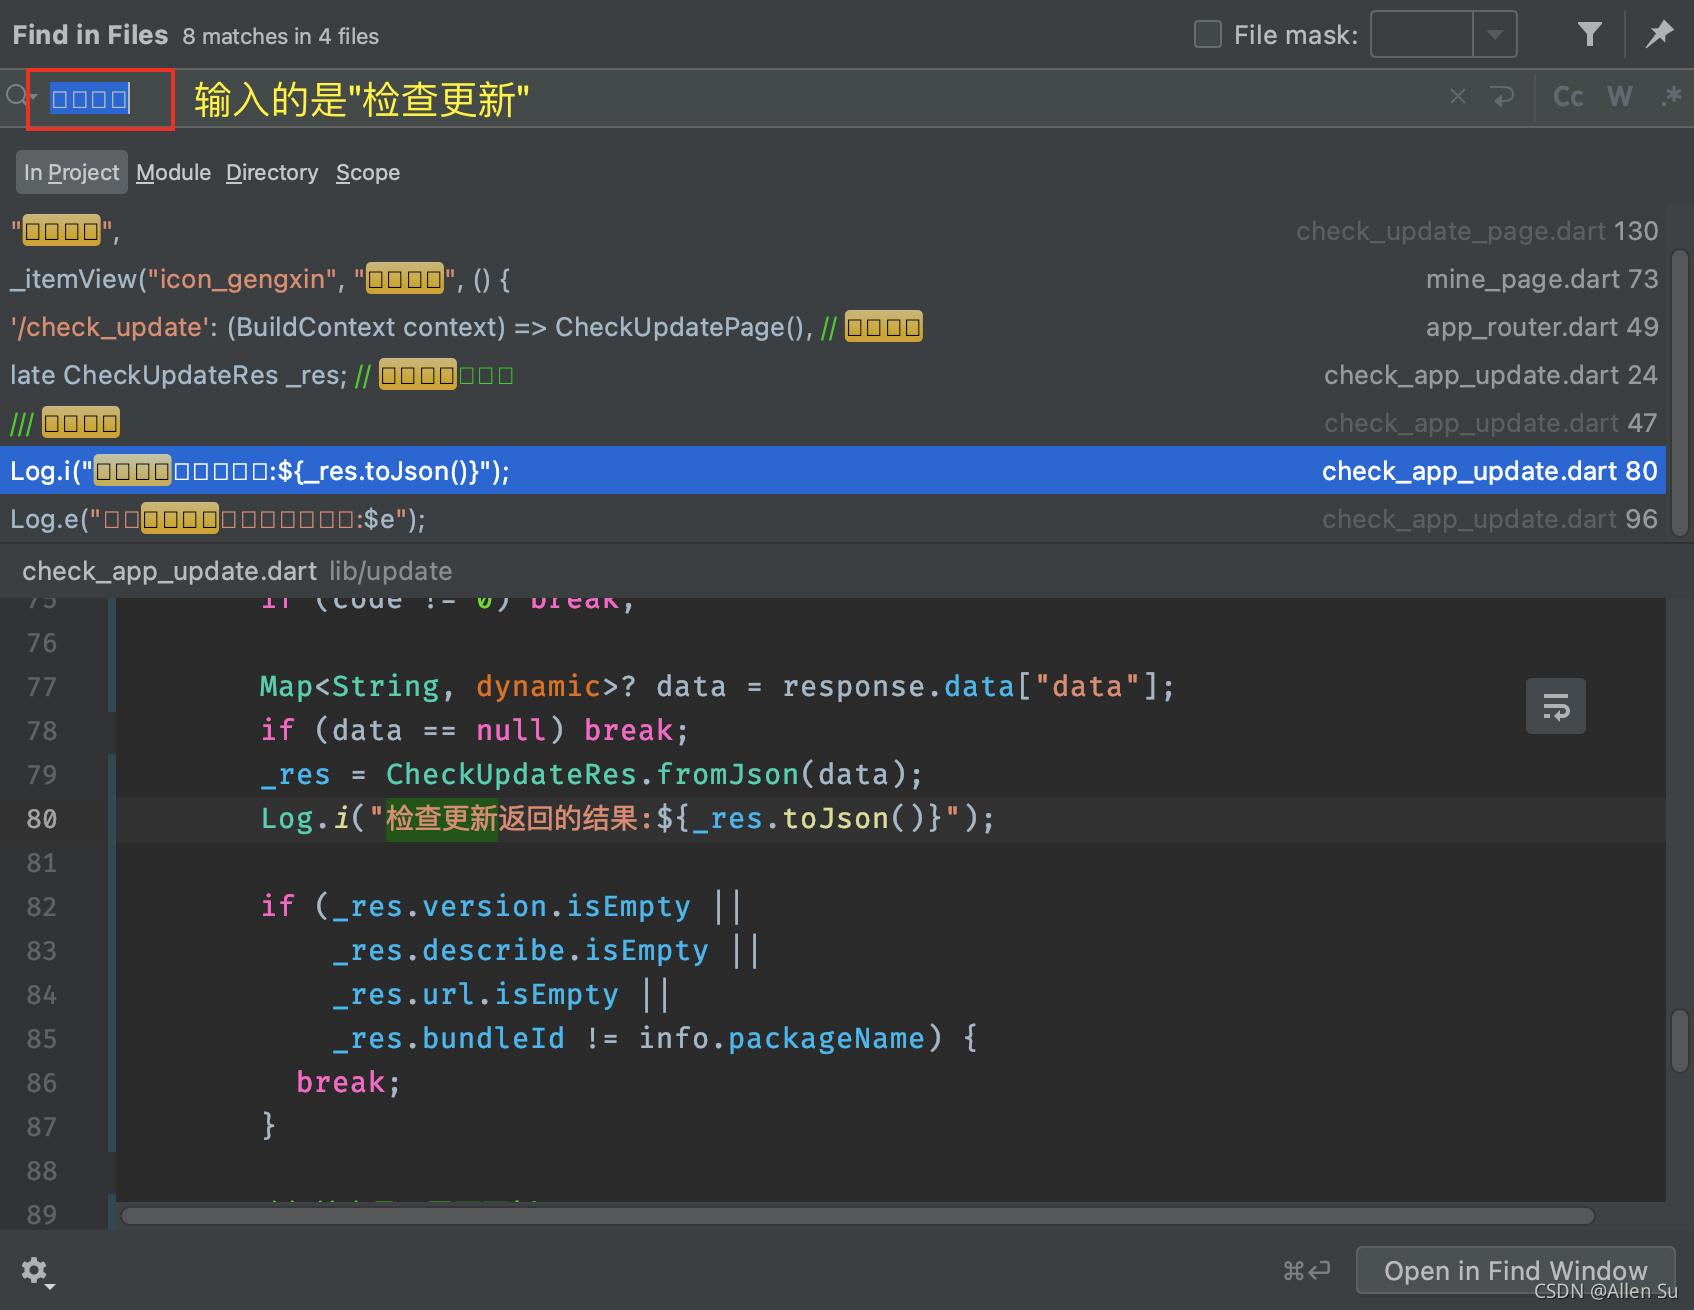 【Android 教程系列第 9 篇】升级 Android Studio 到 Arctic Fox 2020.3.1 后,使用搜索功能时出现中文乱码的问题